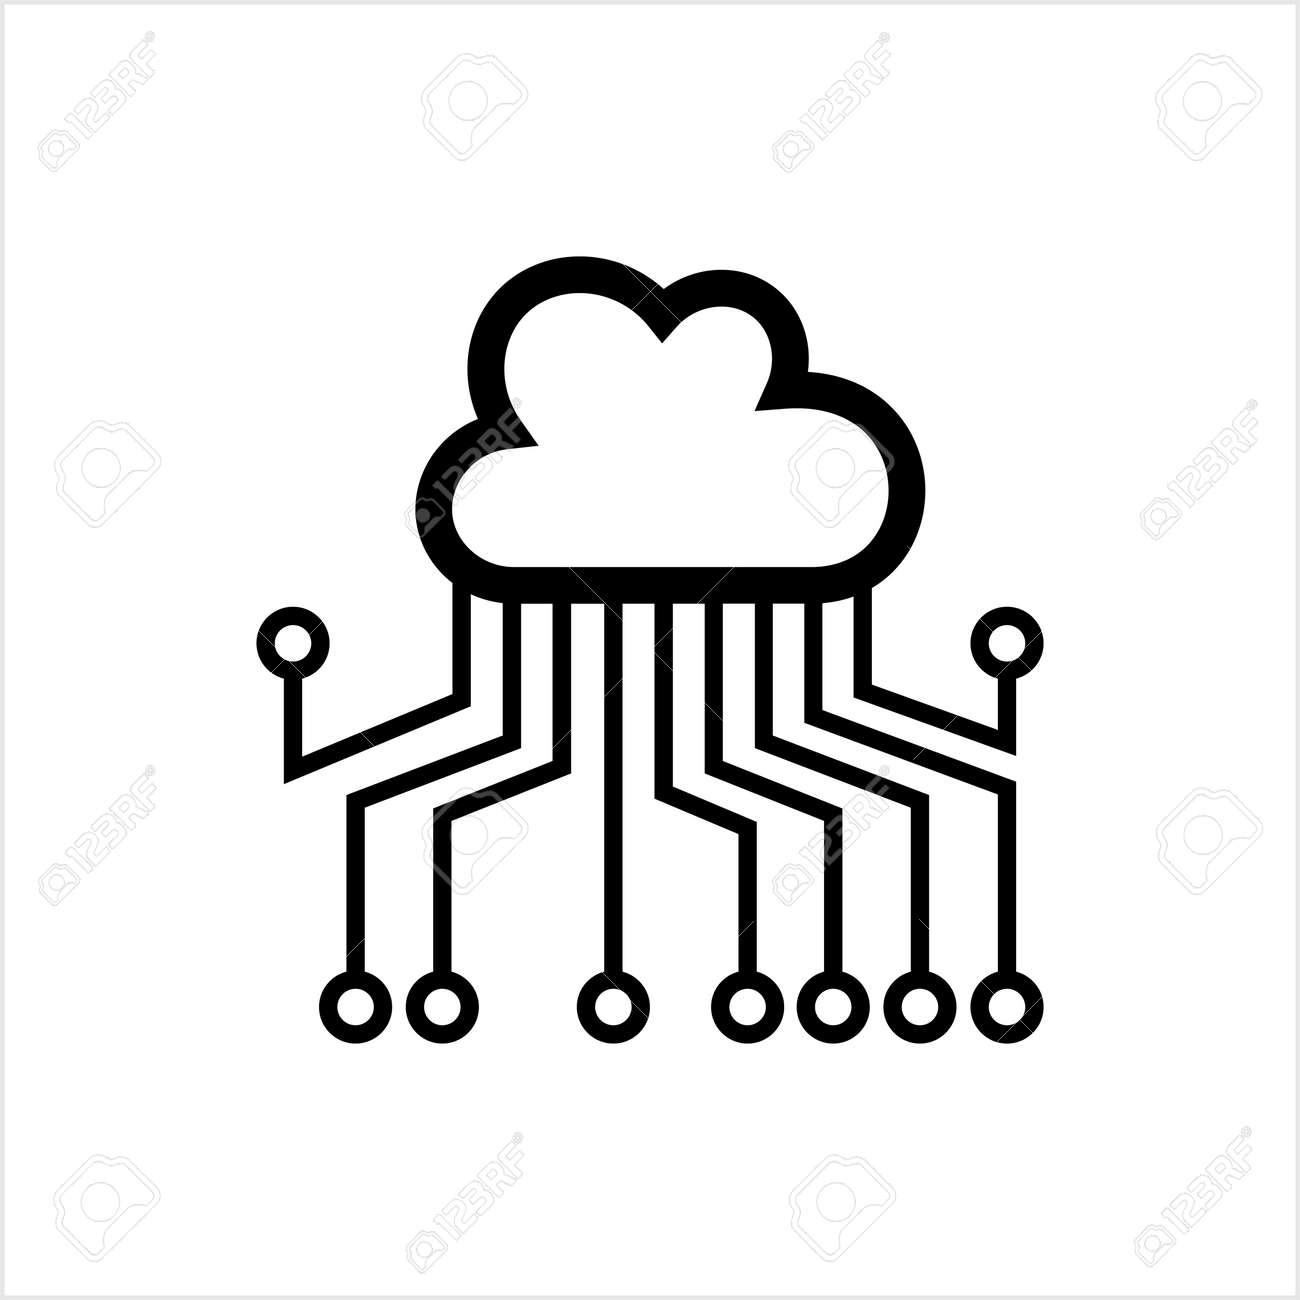 Cloud Network, Cloud Computing Concept Vector Art Illustration - 148095375